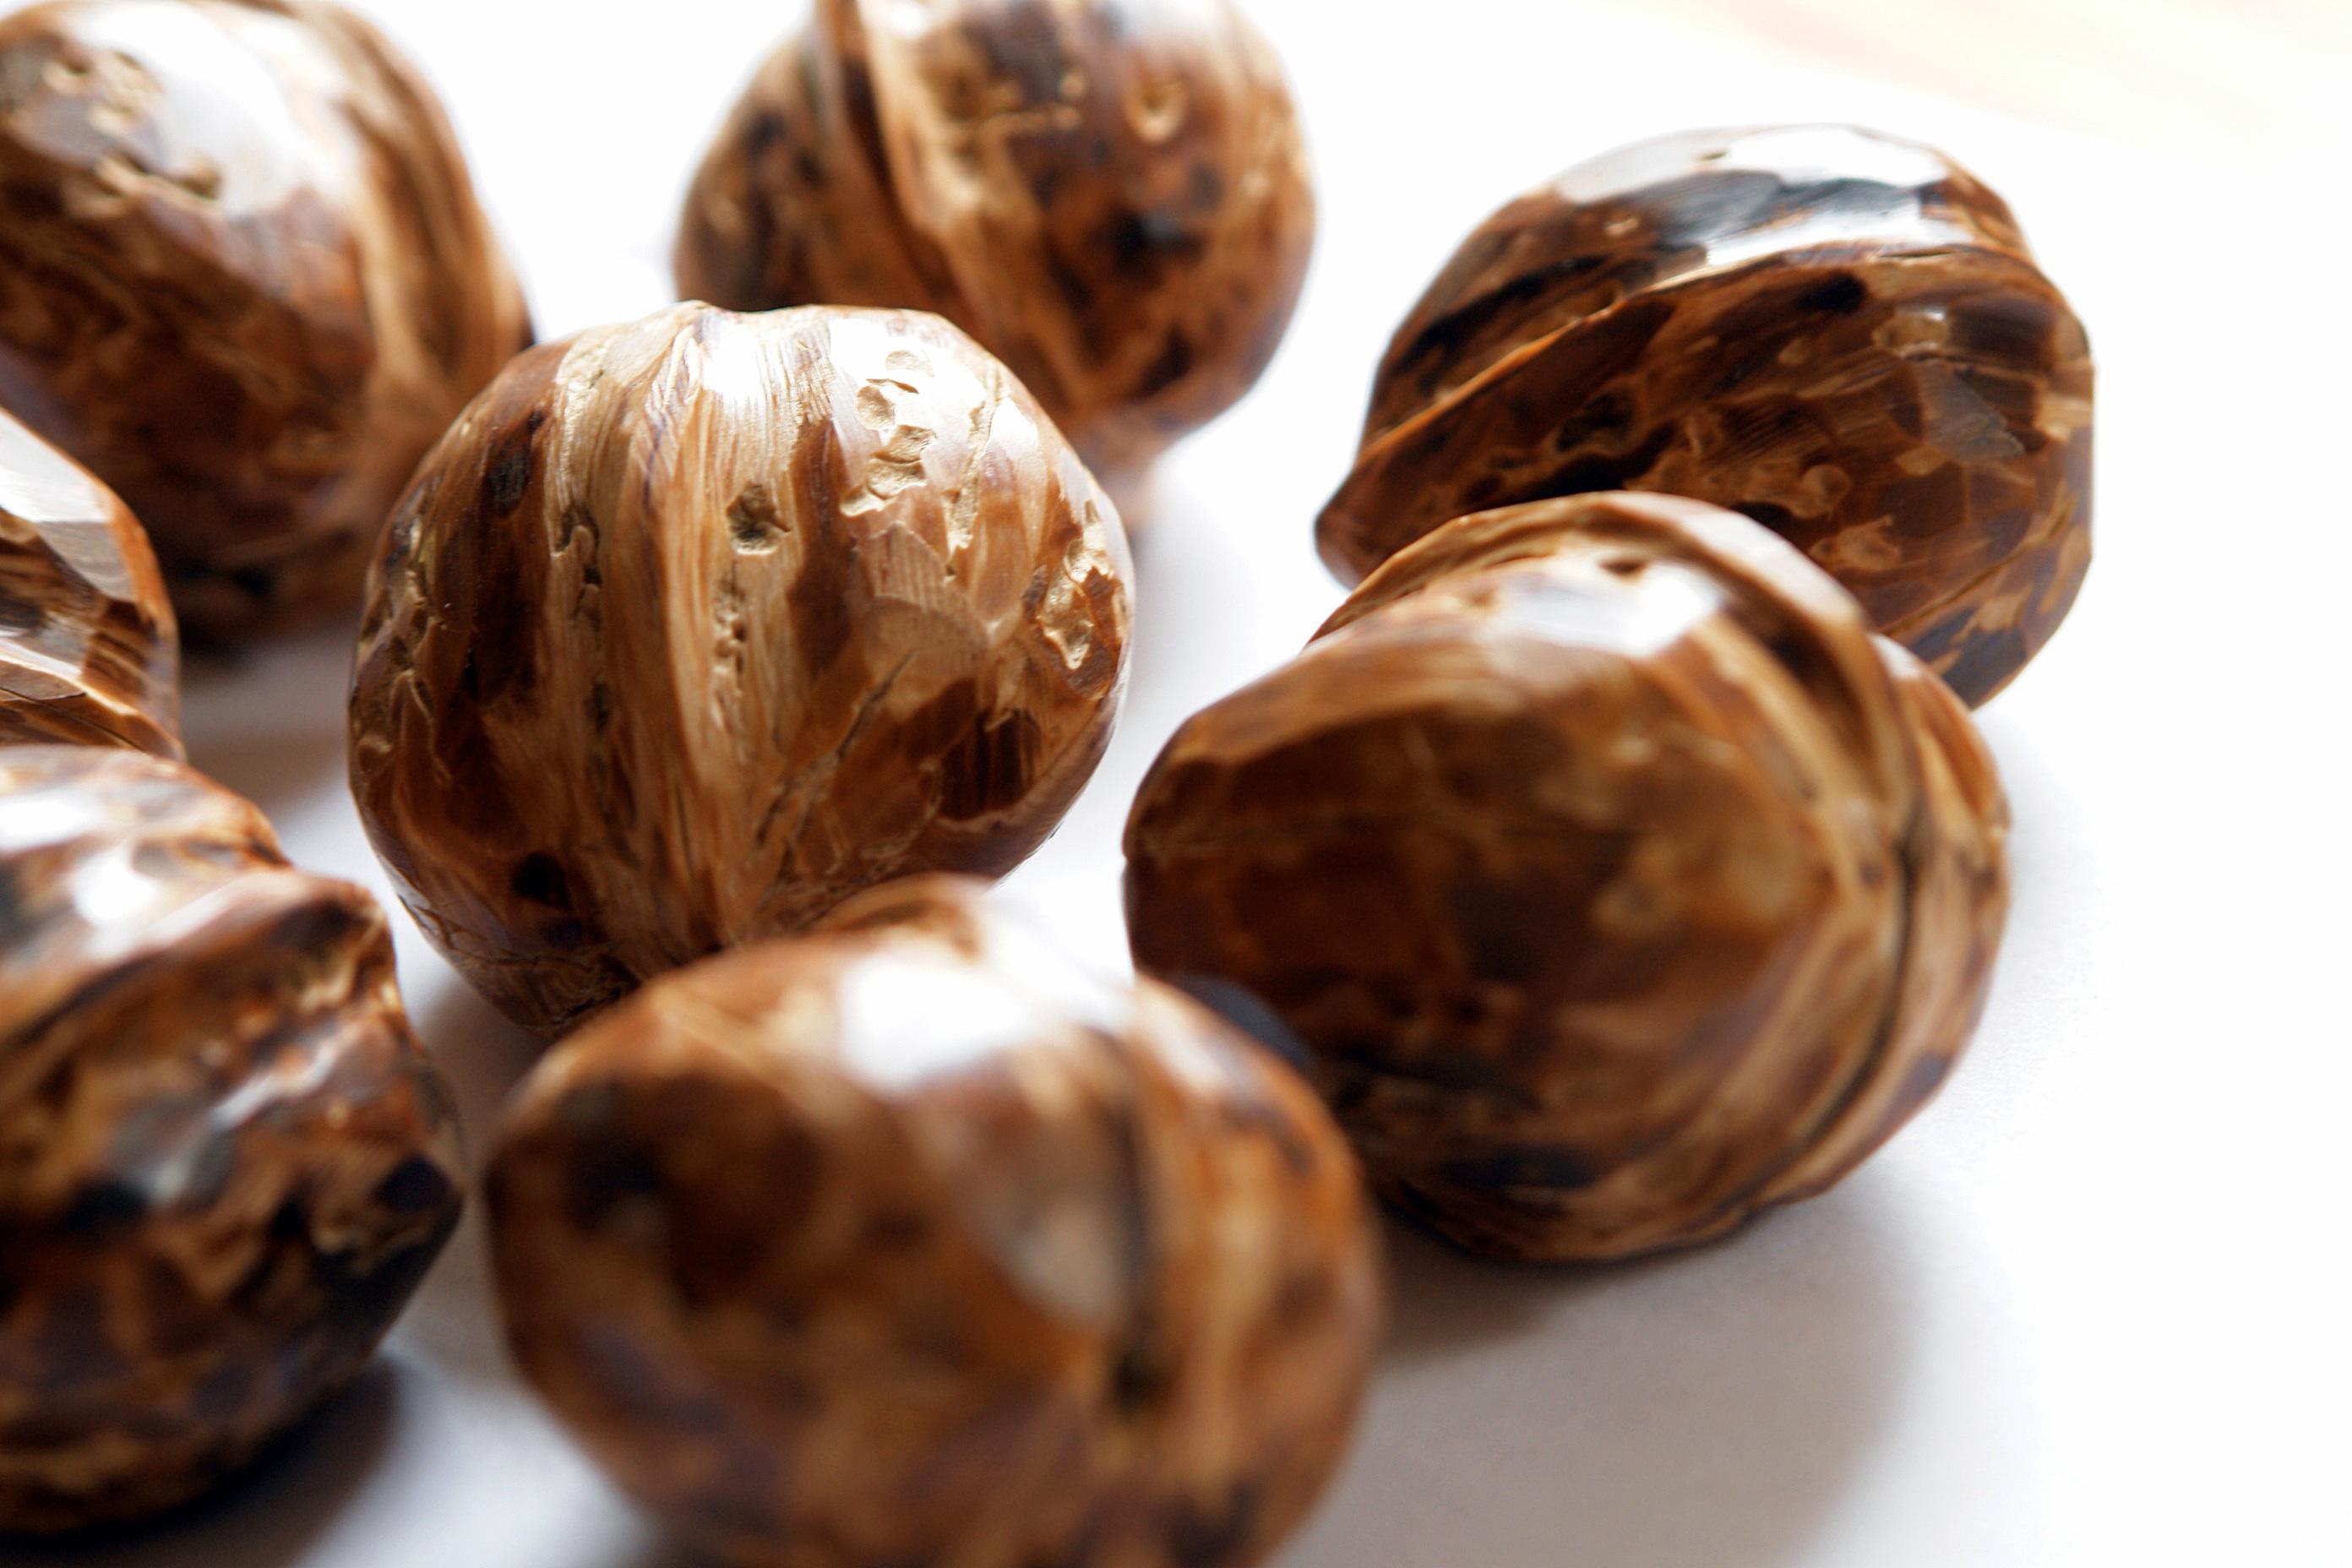 Nut Mandala I., Bread, Medical, Seed, Protein, HQ Photo